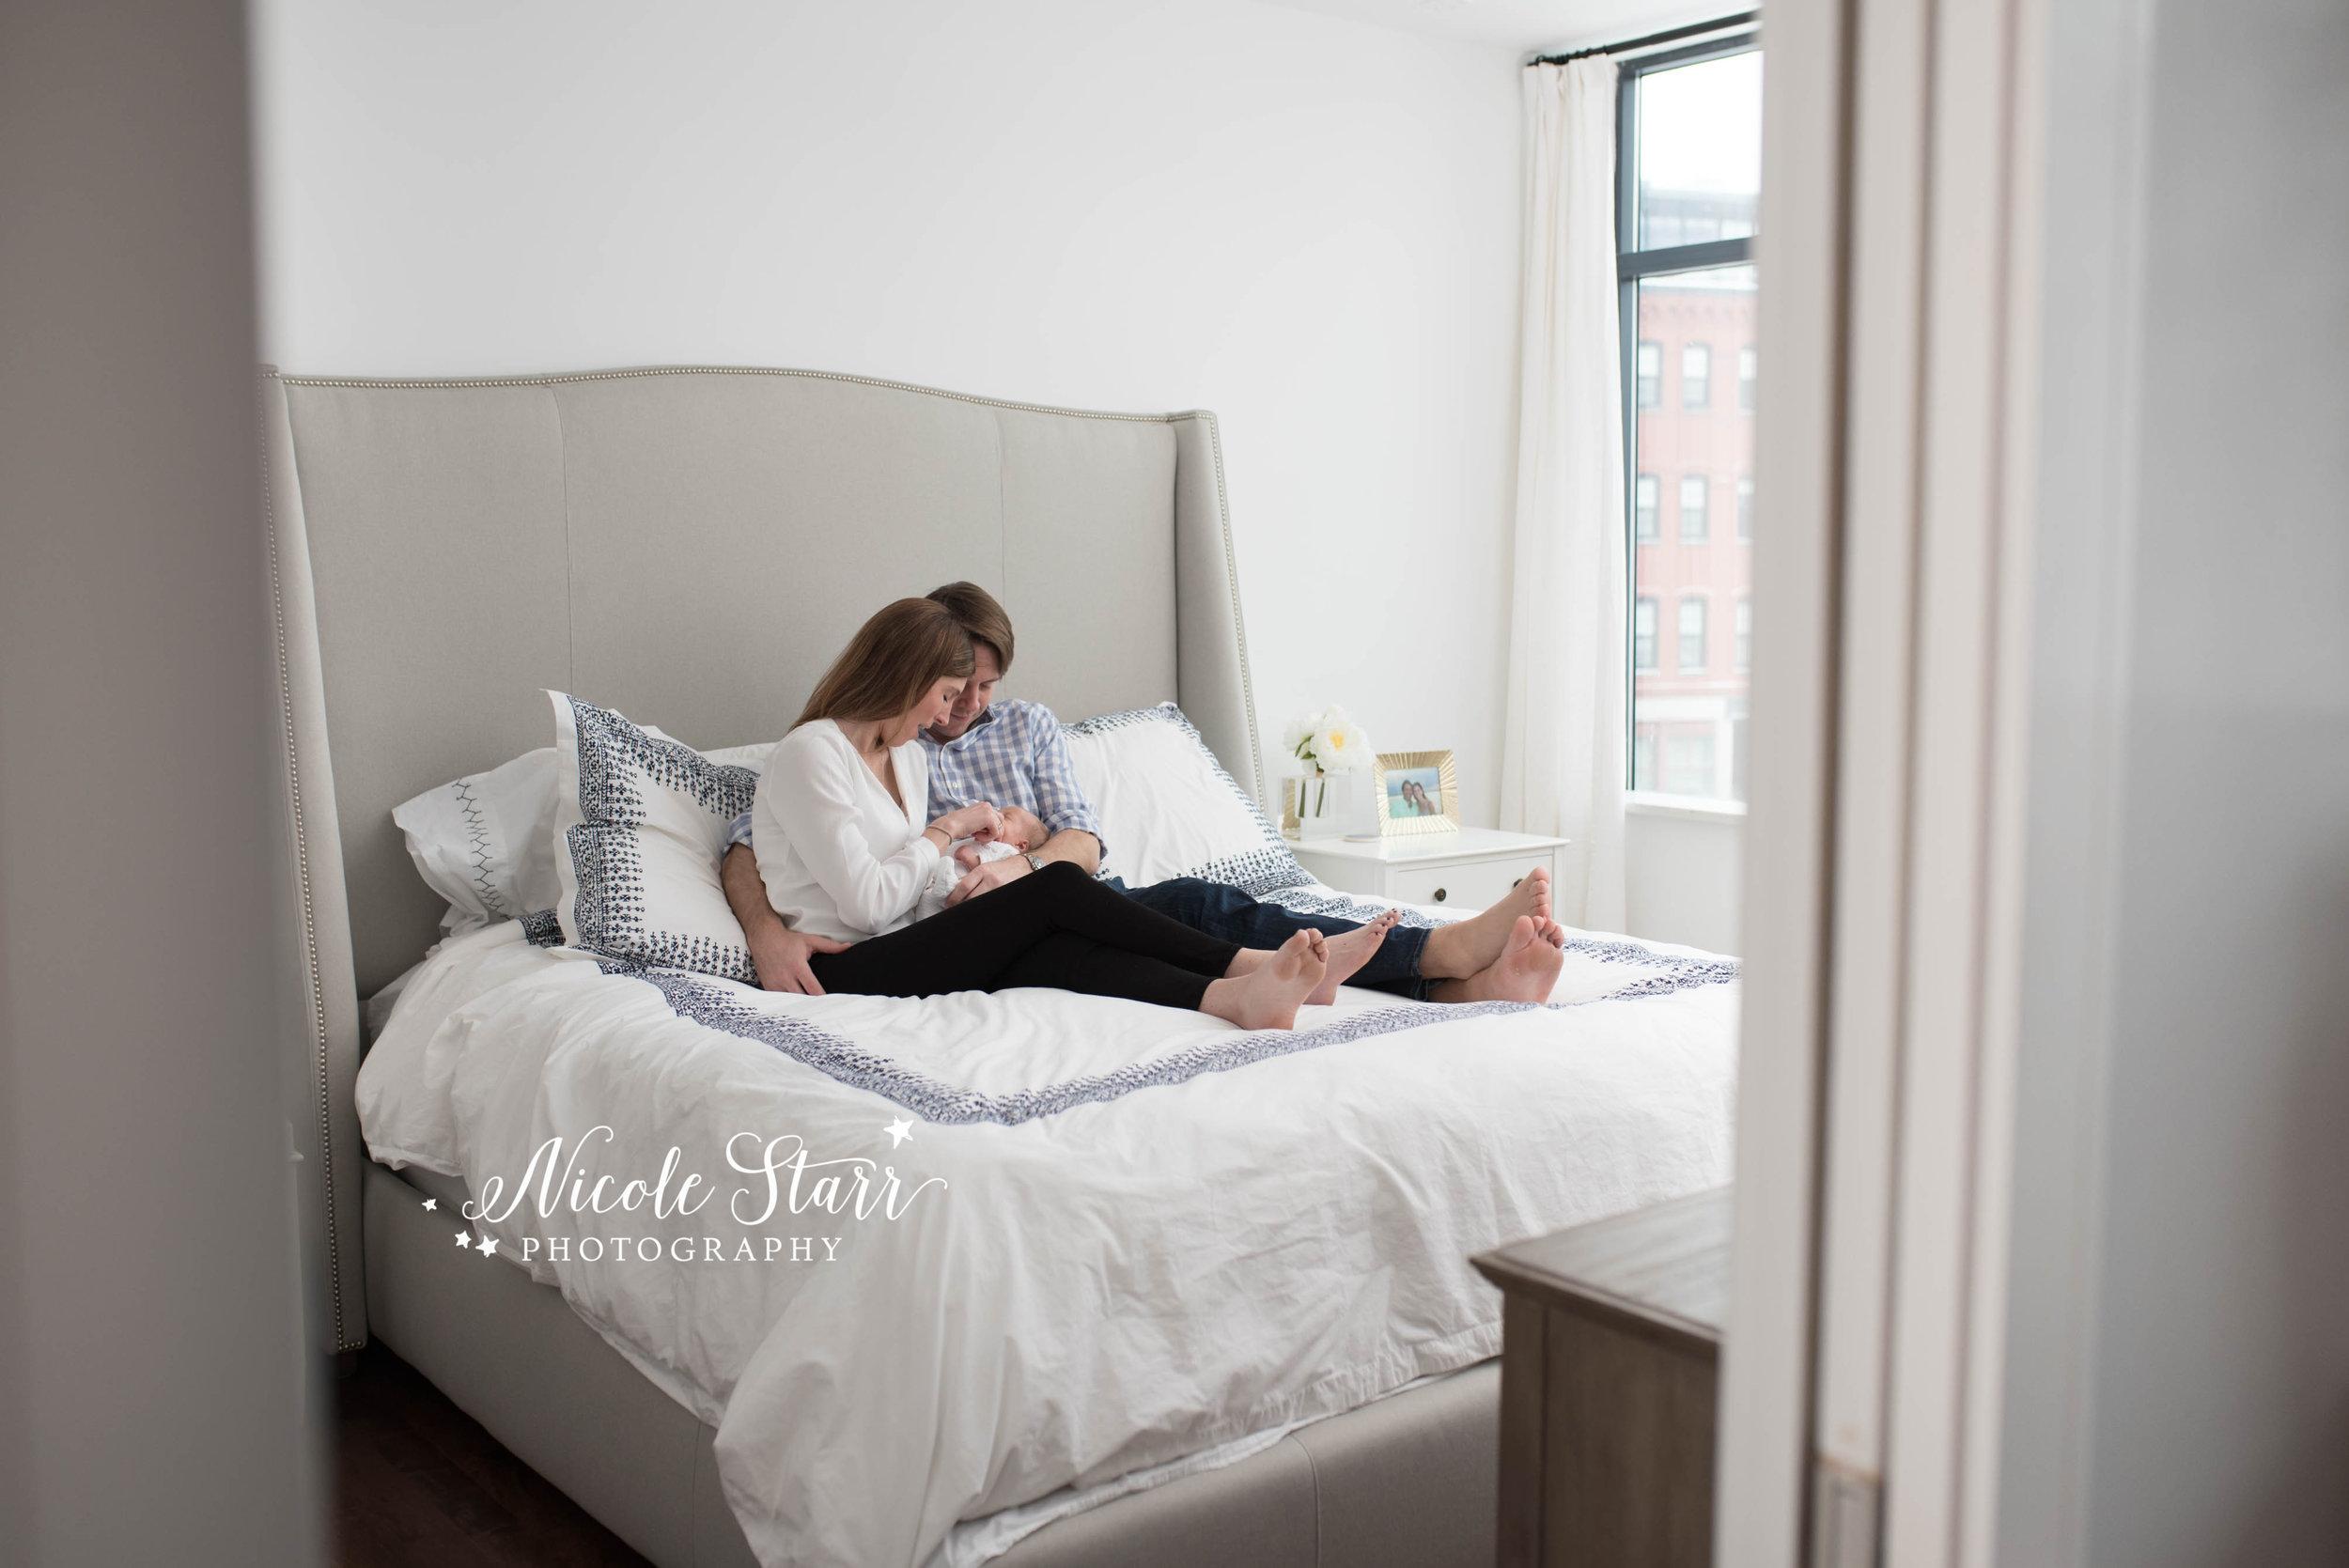 Upstate NY newborn photographer, lifestyle newborn photographer, Boston lifestyle newborn photographer